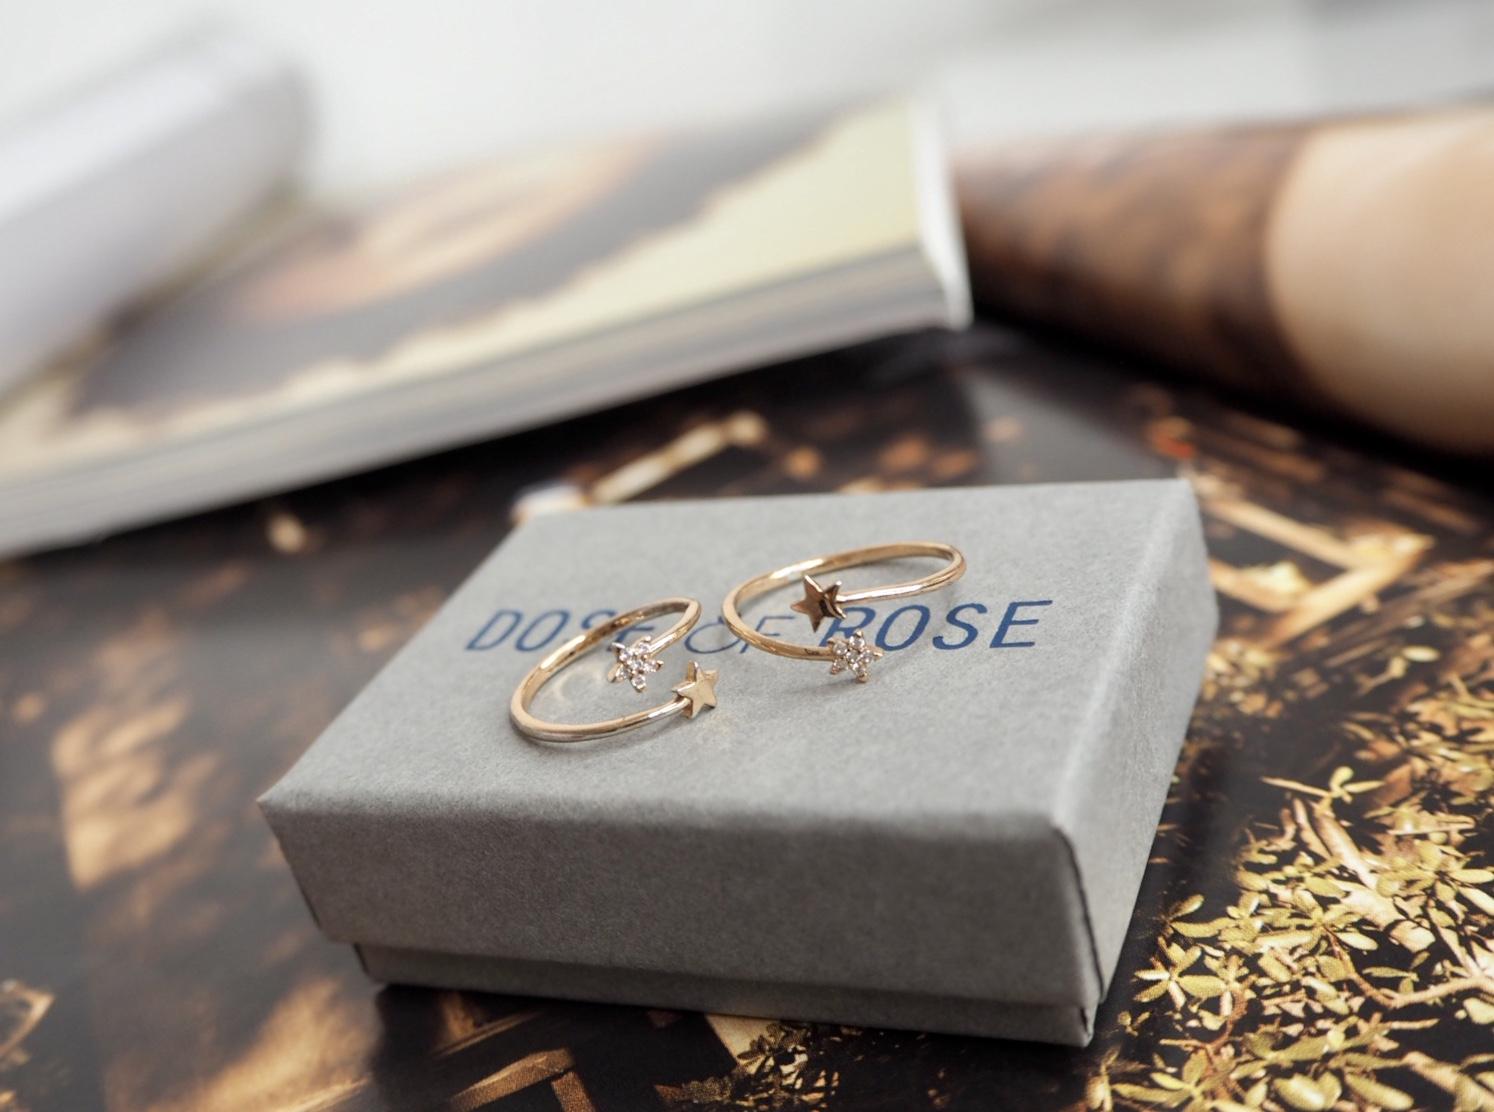 Dose of rose tiny star ring set